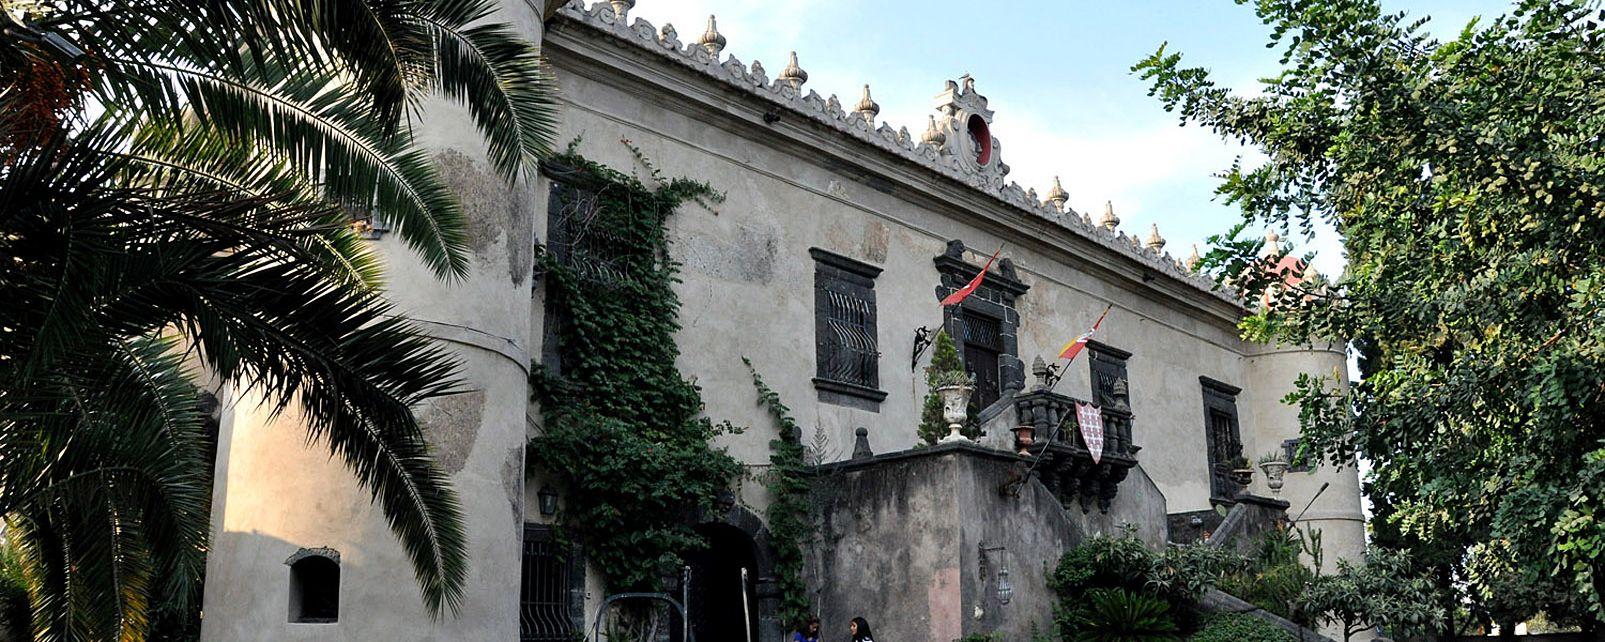 Hotel Castello San Marco